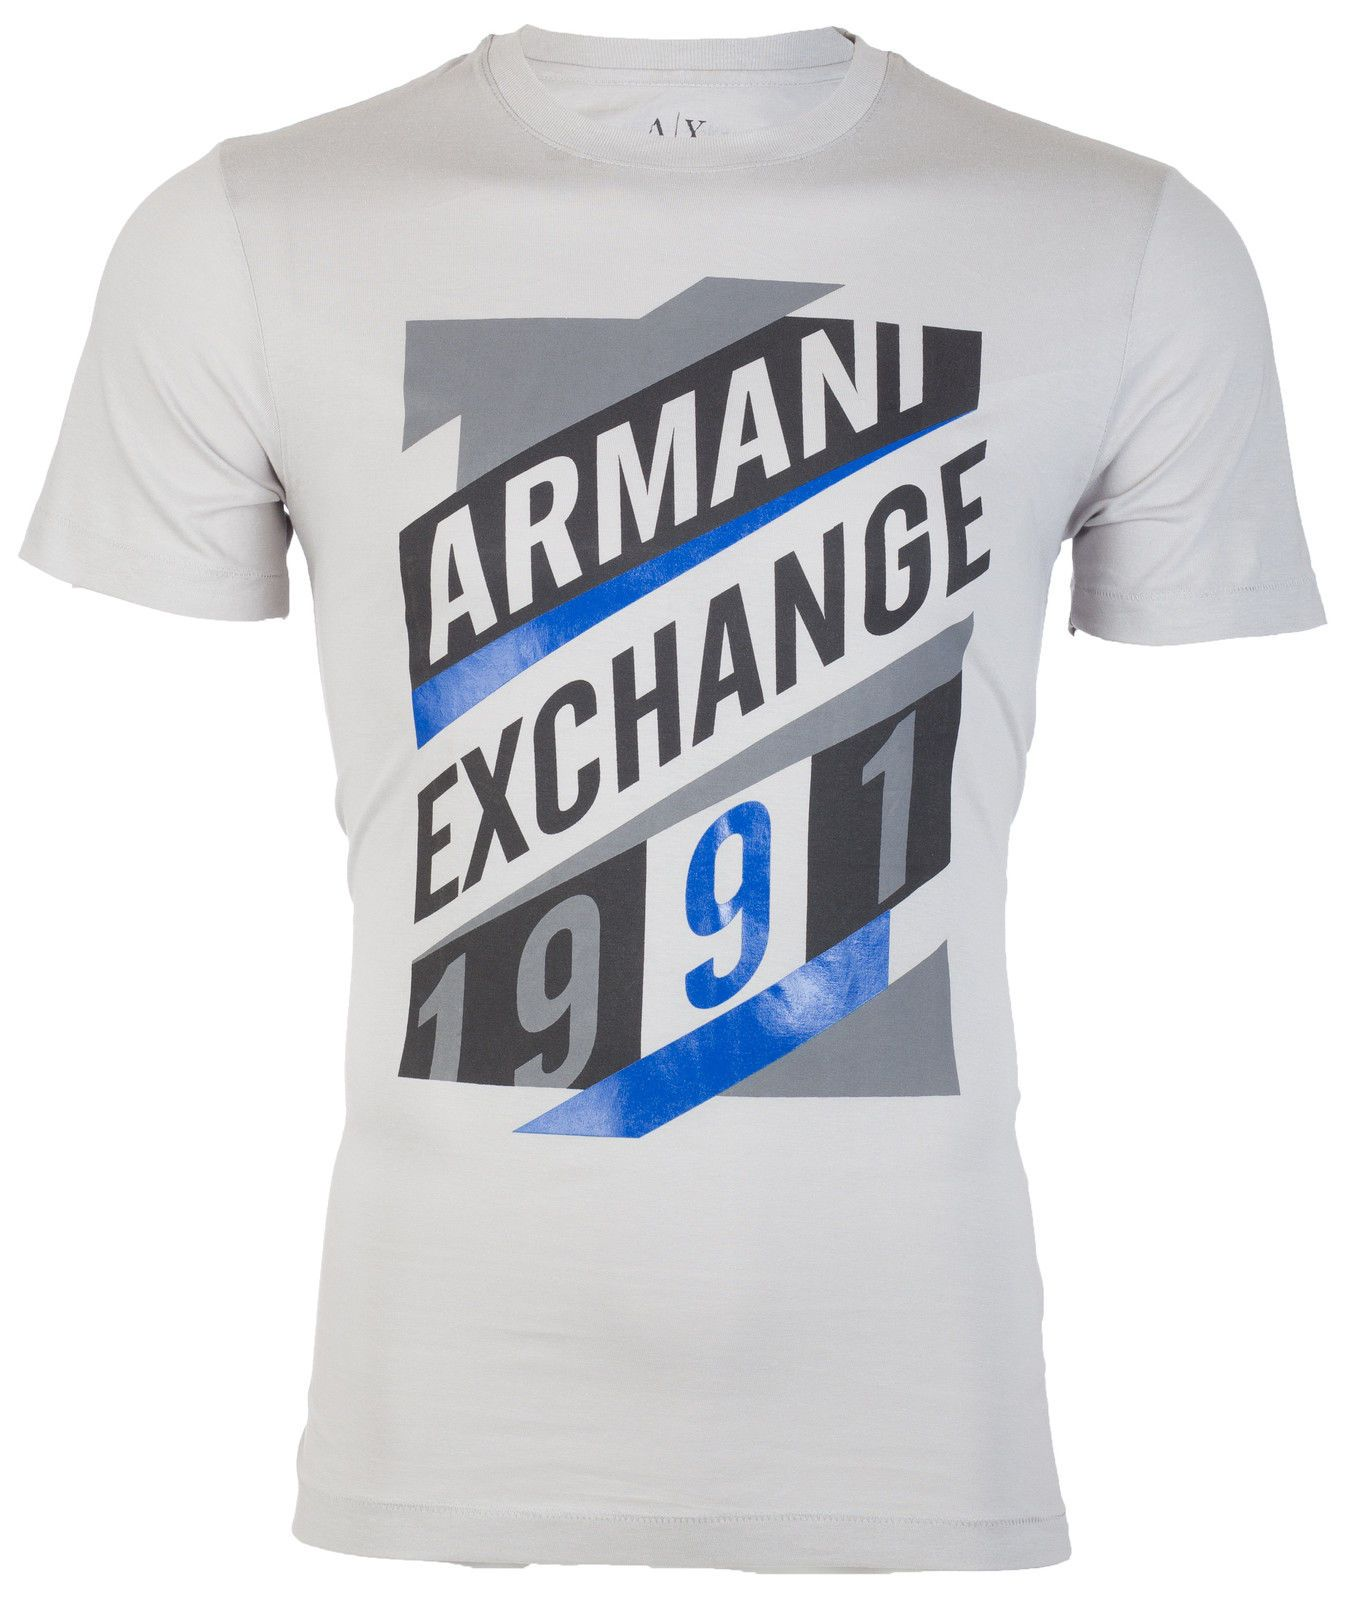 fe5e5d55 ARMANI EXCHANGE Mens T-Shirt AN-16 Slim LIGHT GREY Designer $45 ...